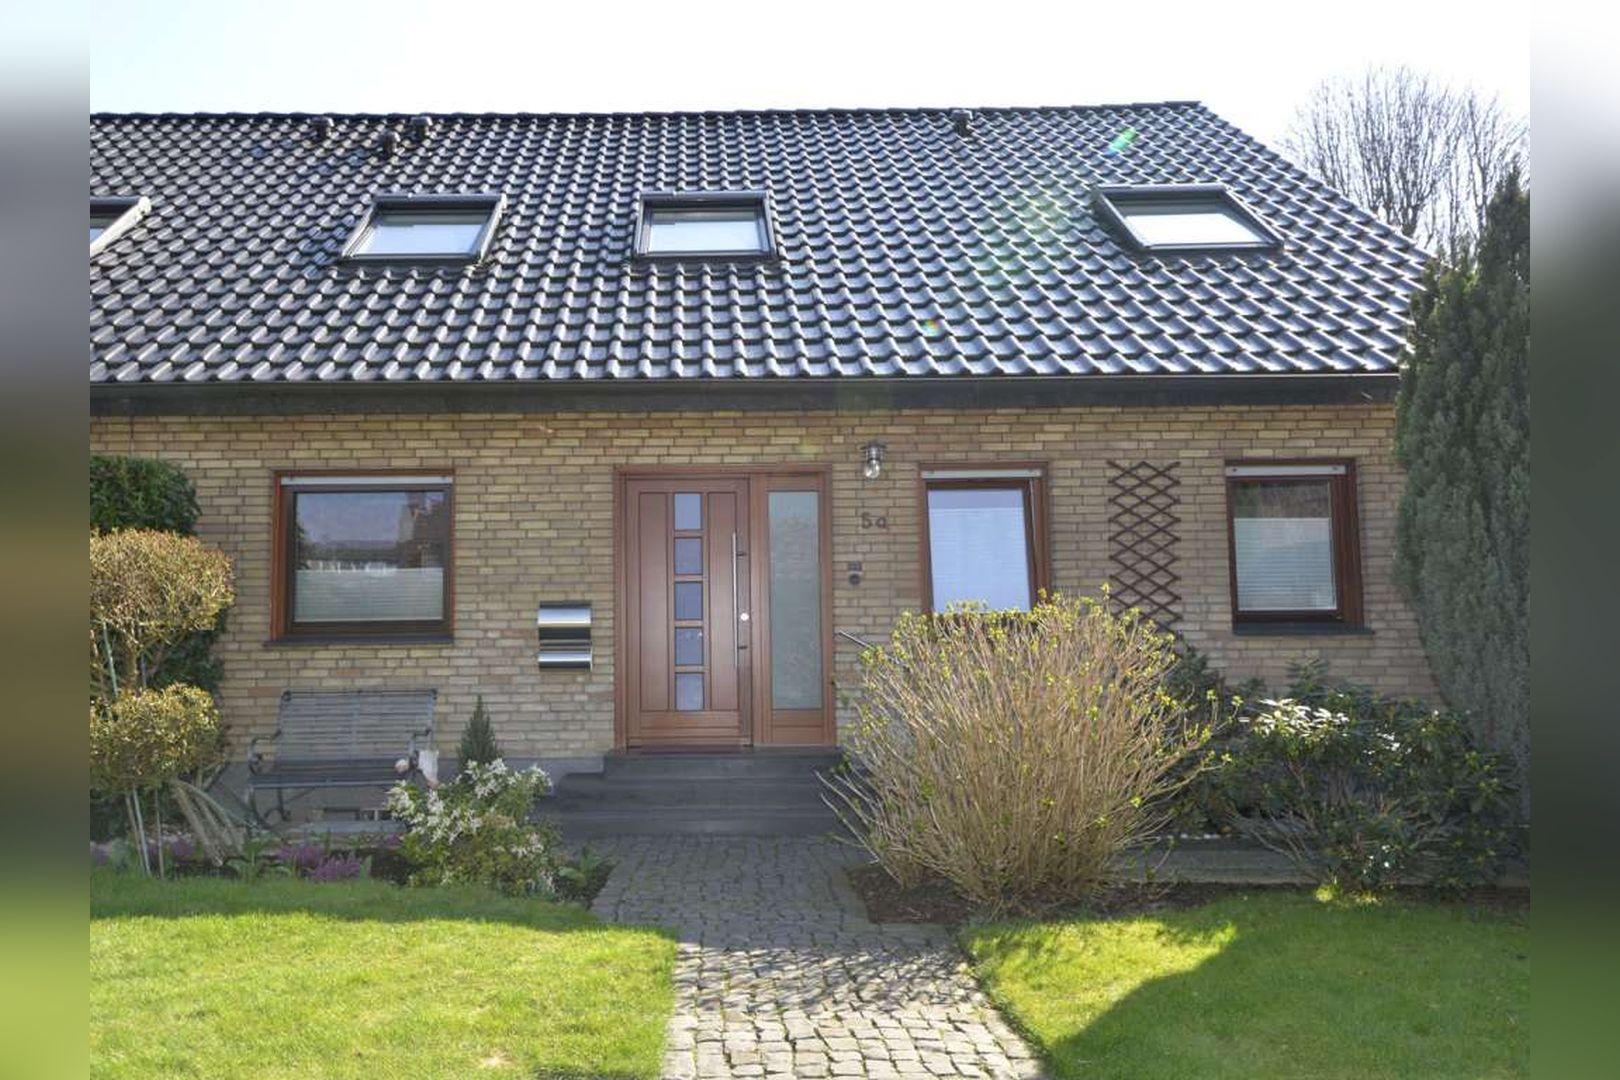 Immobilie Nr.0254 | Haselweg 5 a, 40668 Meerbusch -Bösingh.